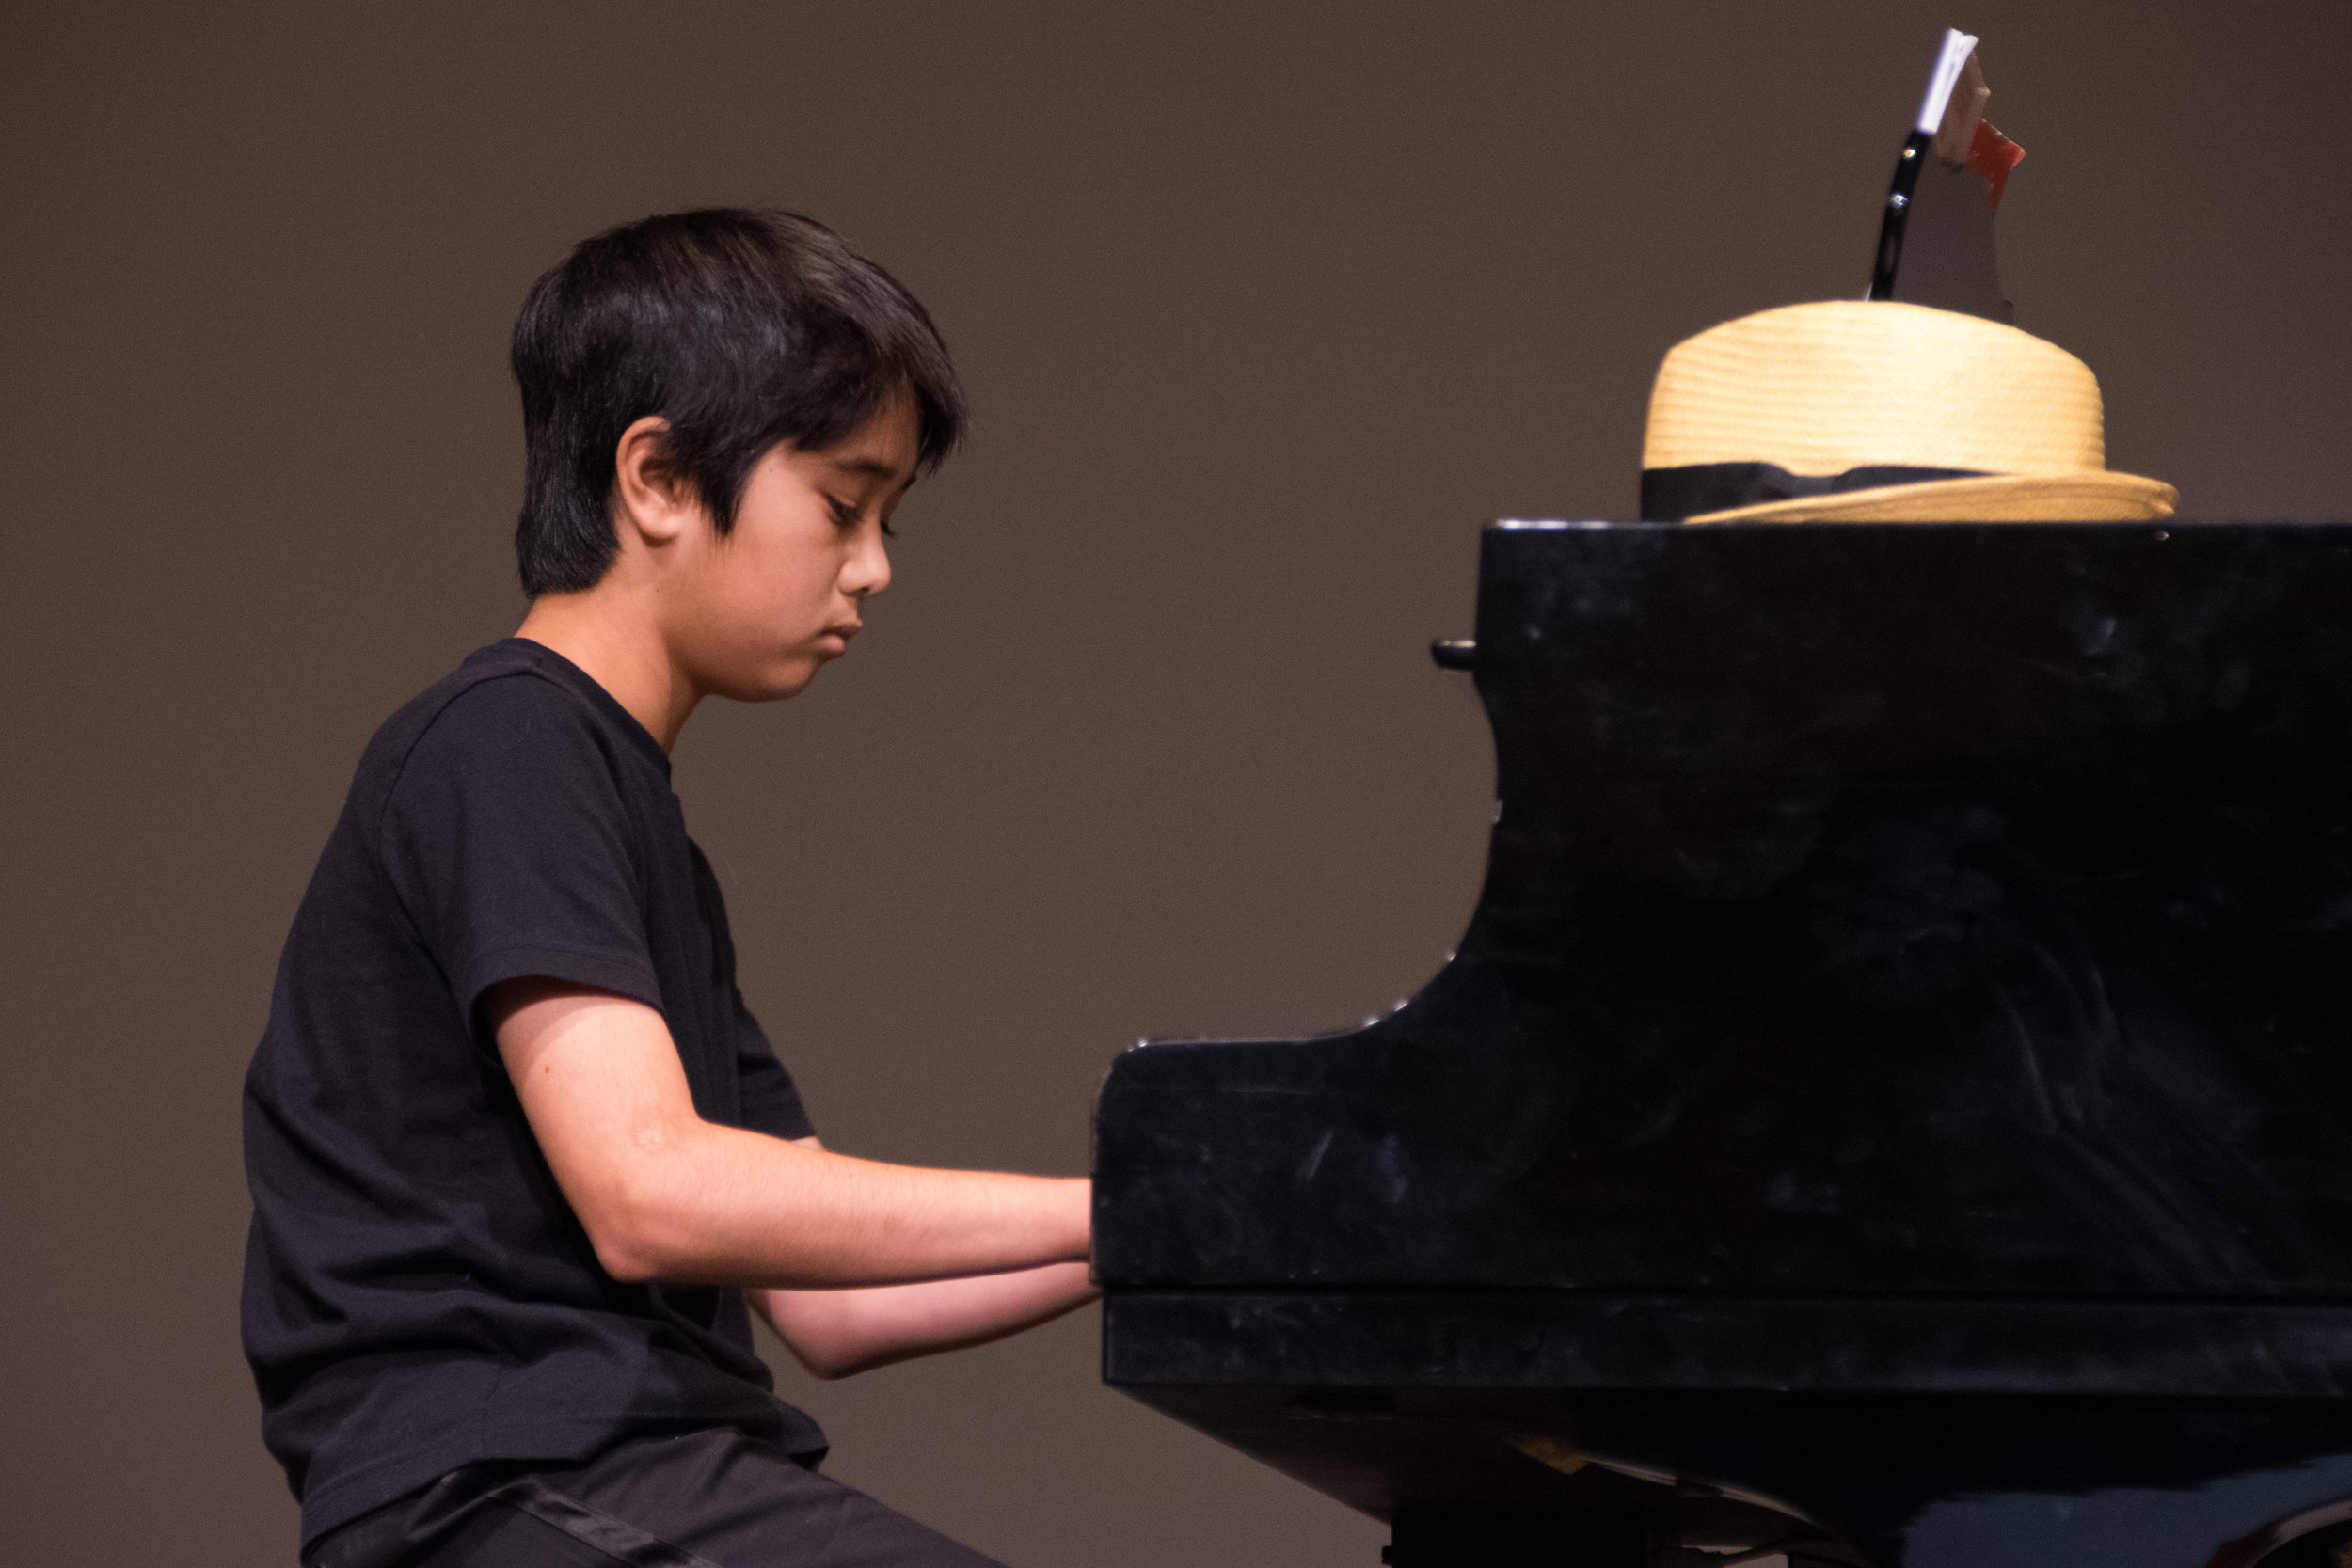 Jacob Chen